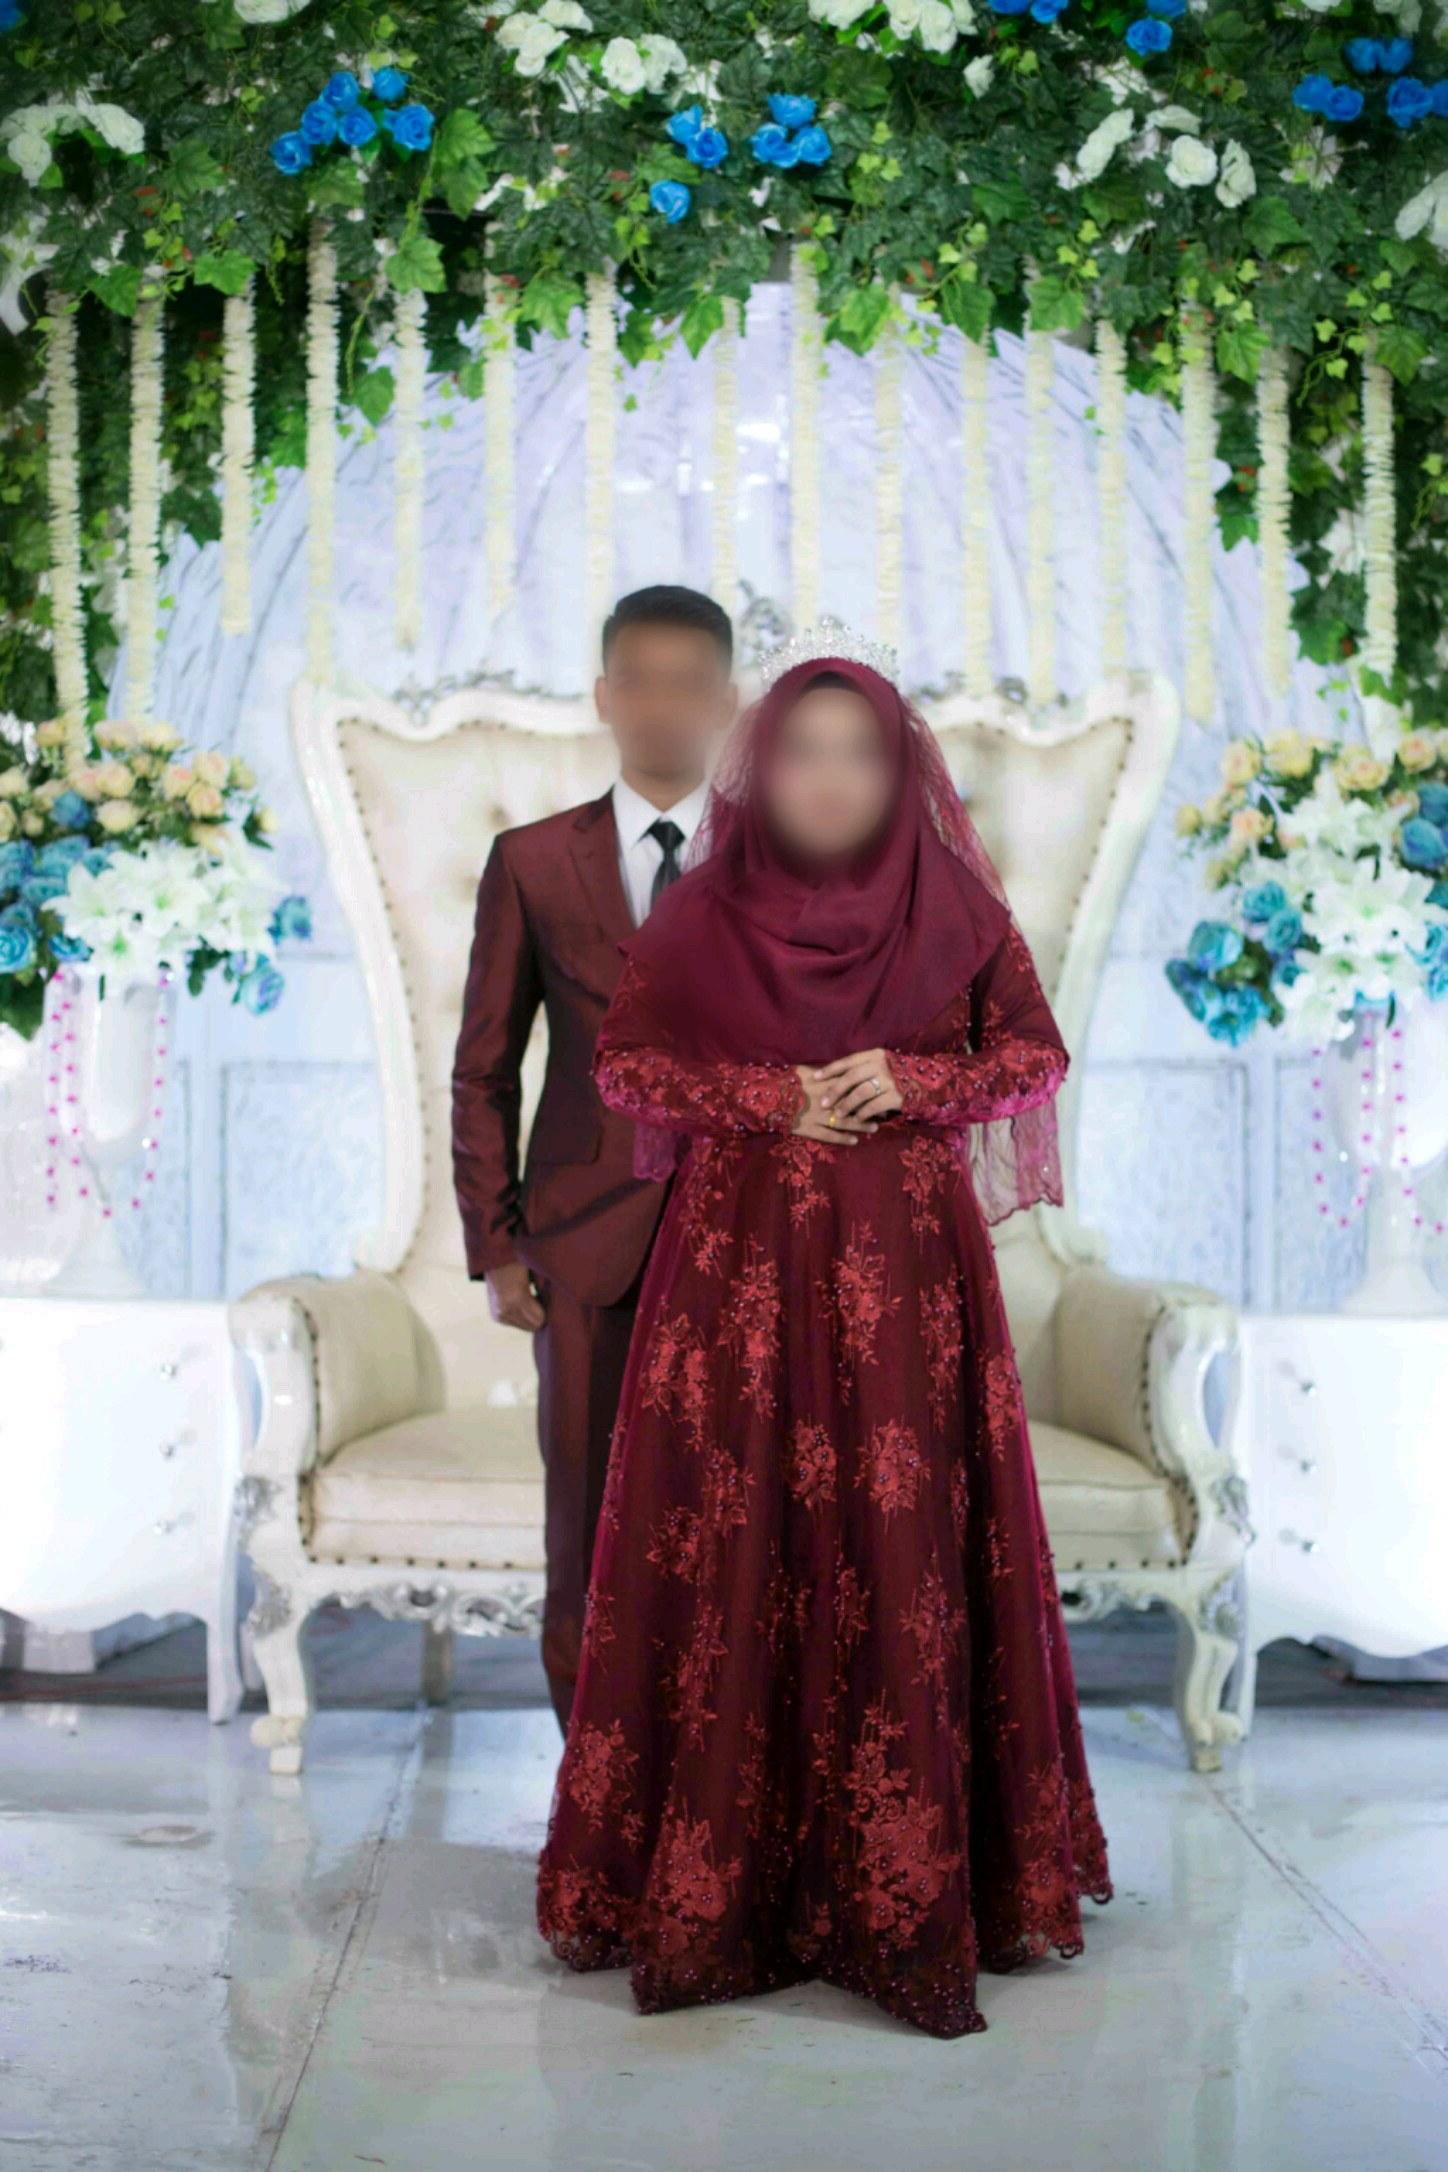 Bentuk Gaun Pengantin Muslimah Warna Merah Marun Tldn Jual Produk Jas Pengantin Merah Maroon Murah Dan Terlengkap